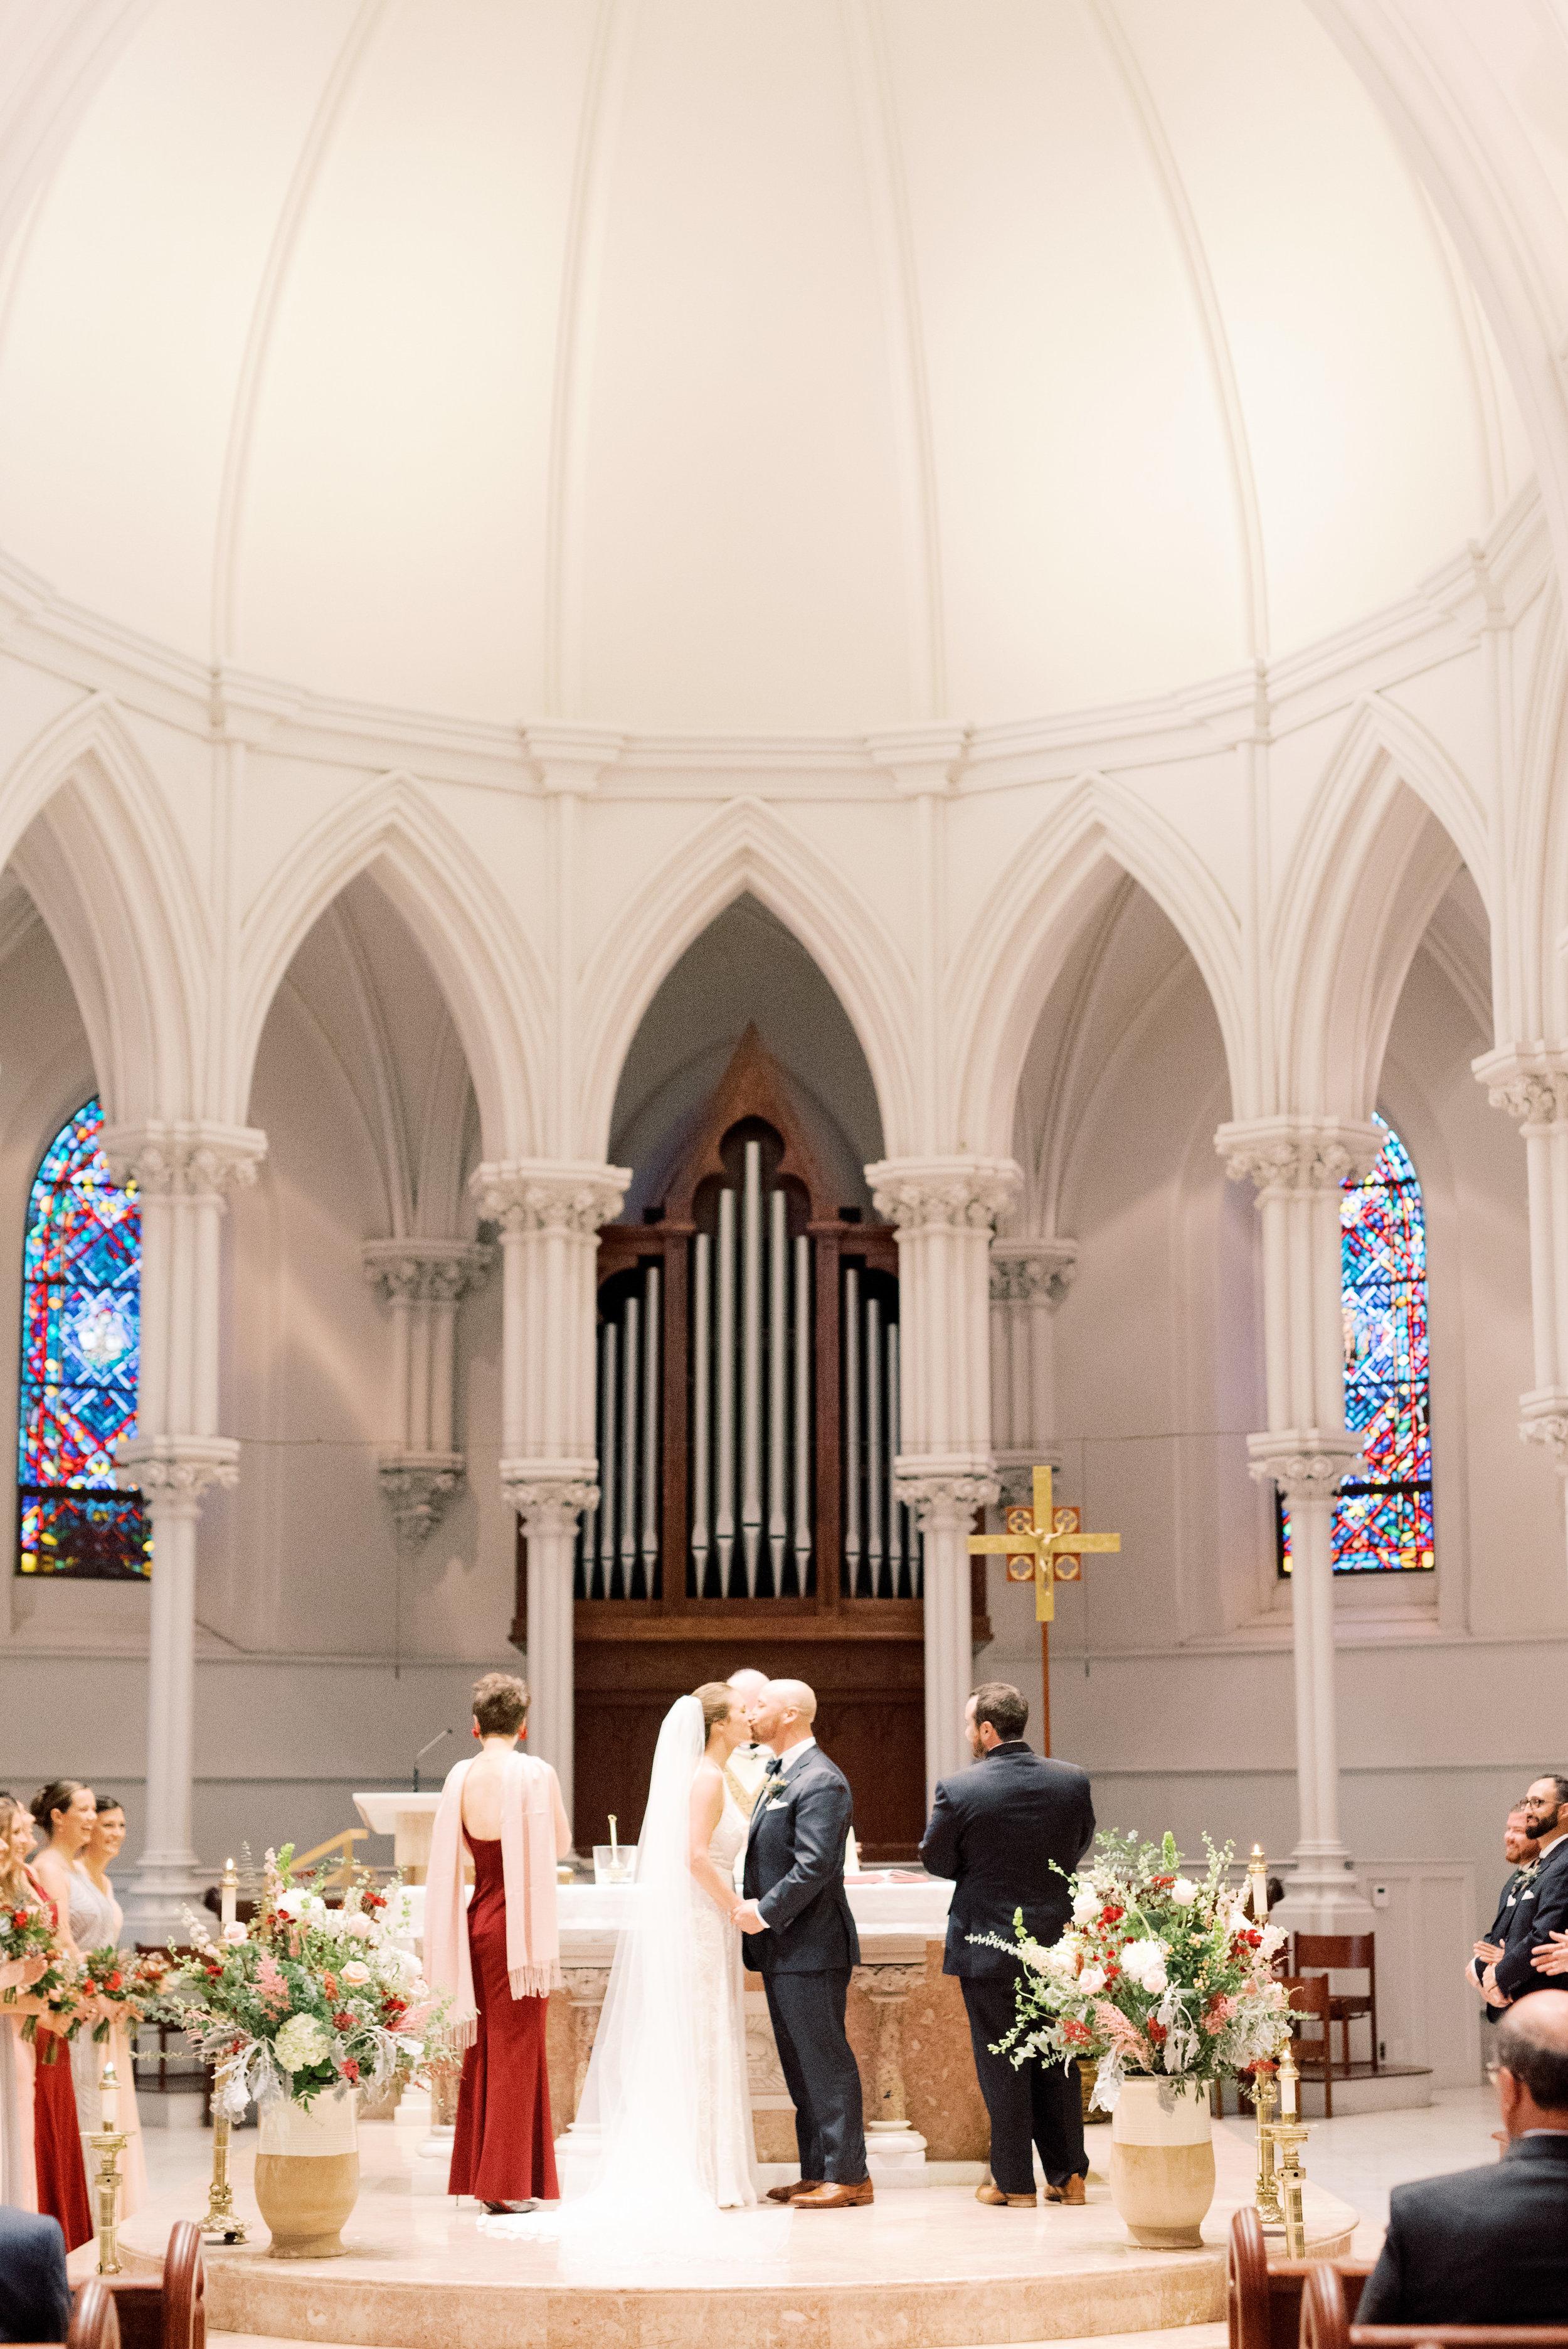 haley-richter-photography-october-pomme-wedding-in-radnor-032.jpg